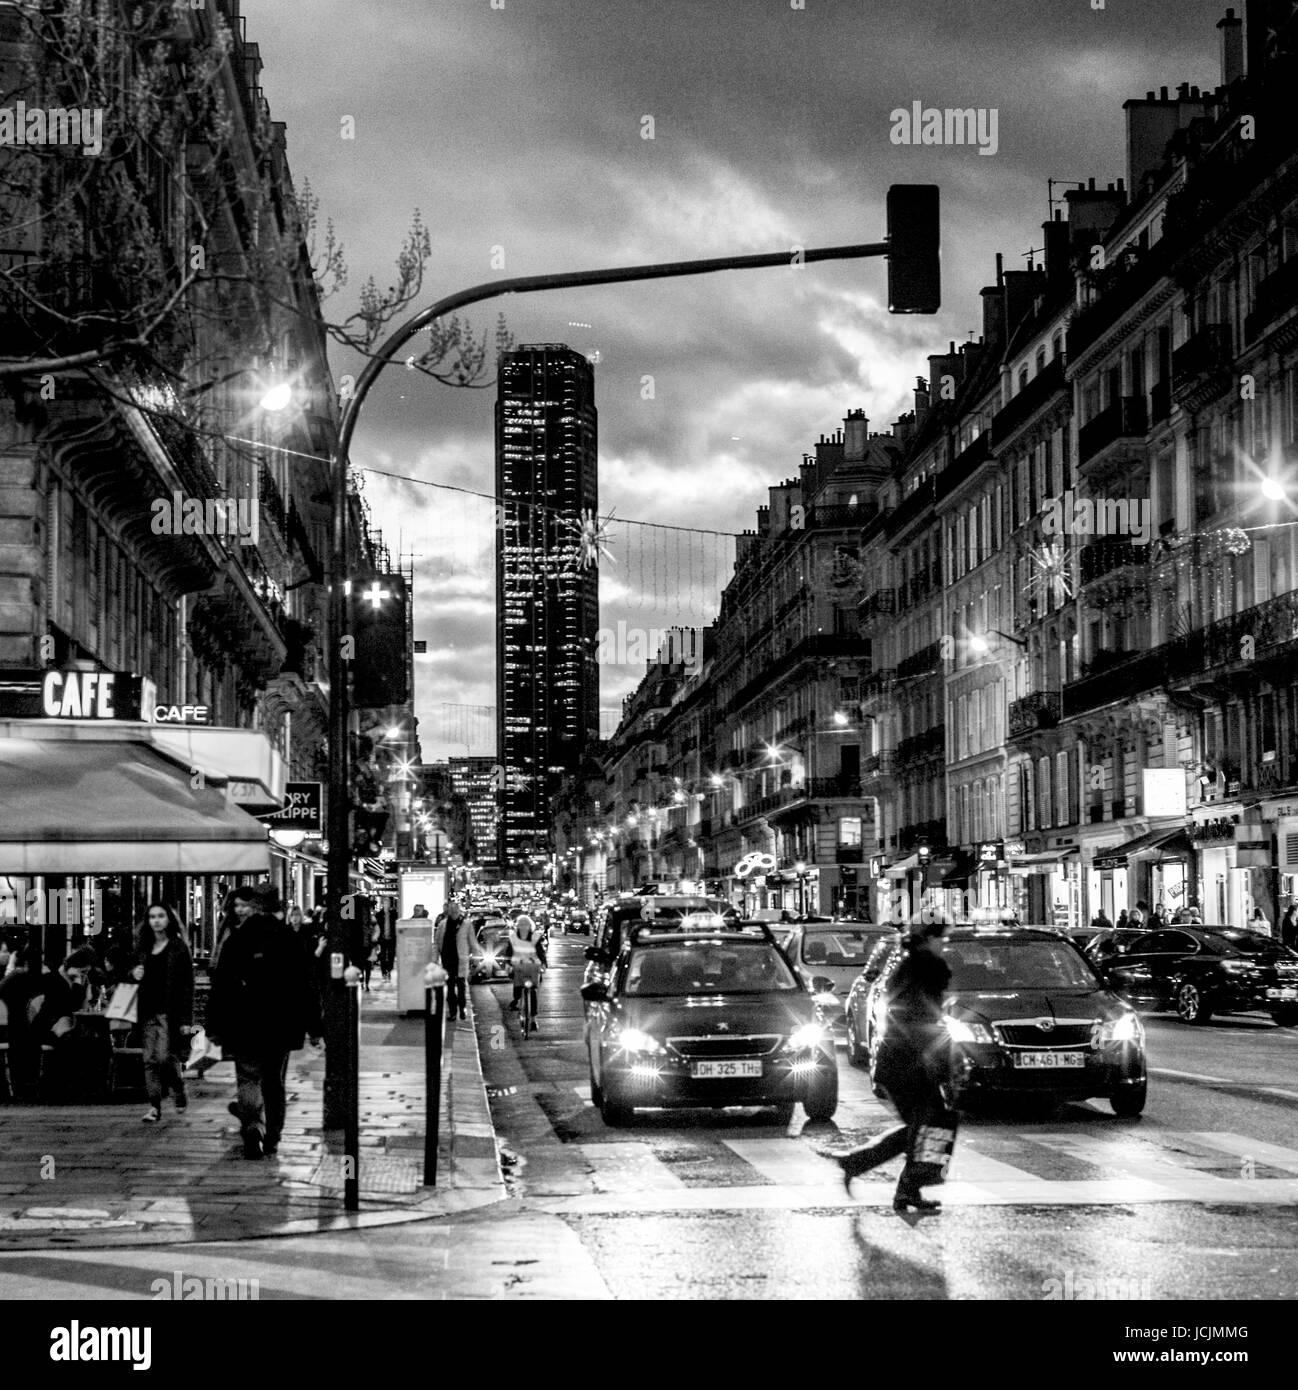 PARIS- FRANCE -  RUE DE RENNES AND MONTPARNASSE TOWER AT LATE AFTERNOON - PARIS STREET - PARIS STREET PHOTOGRAPHY - Stock Image